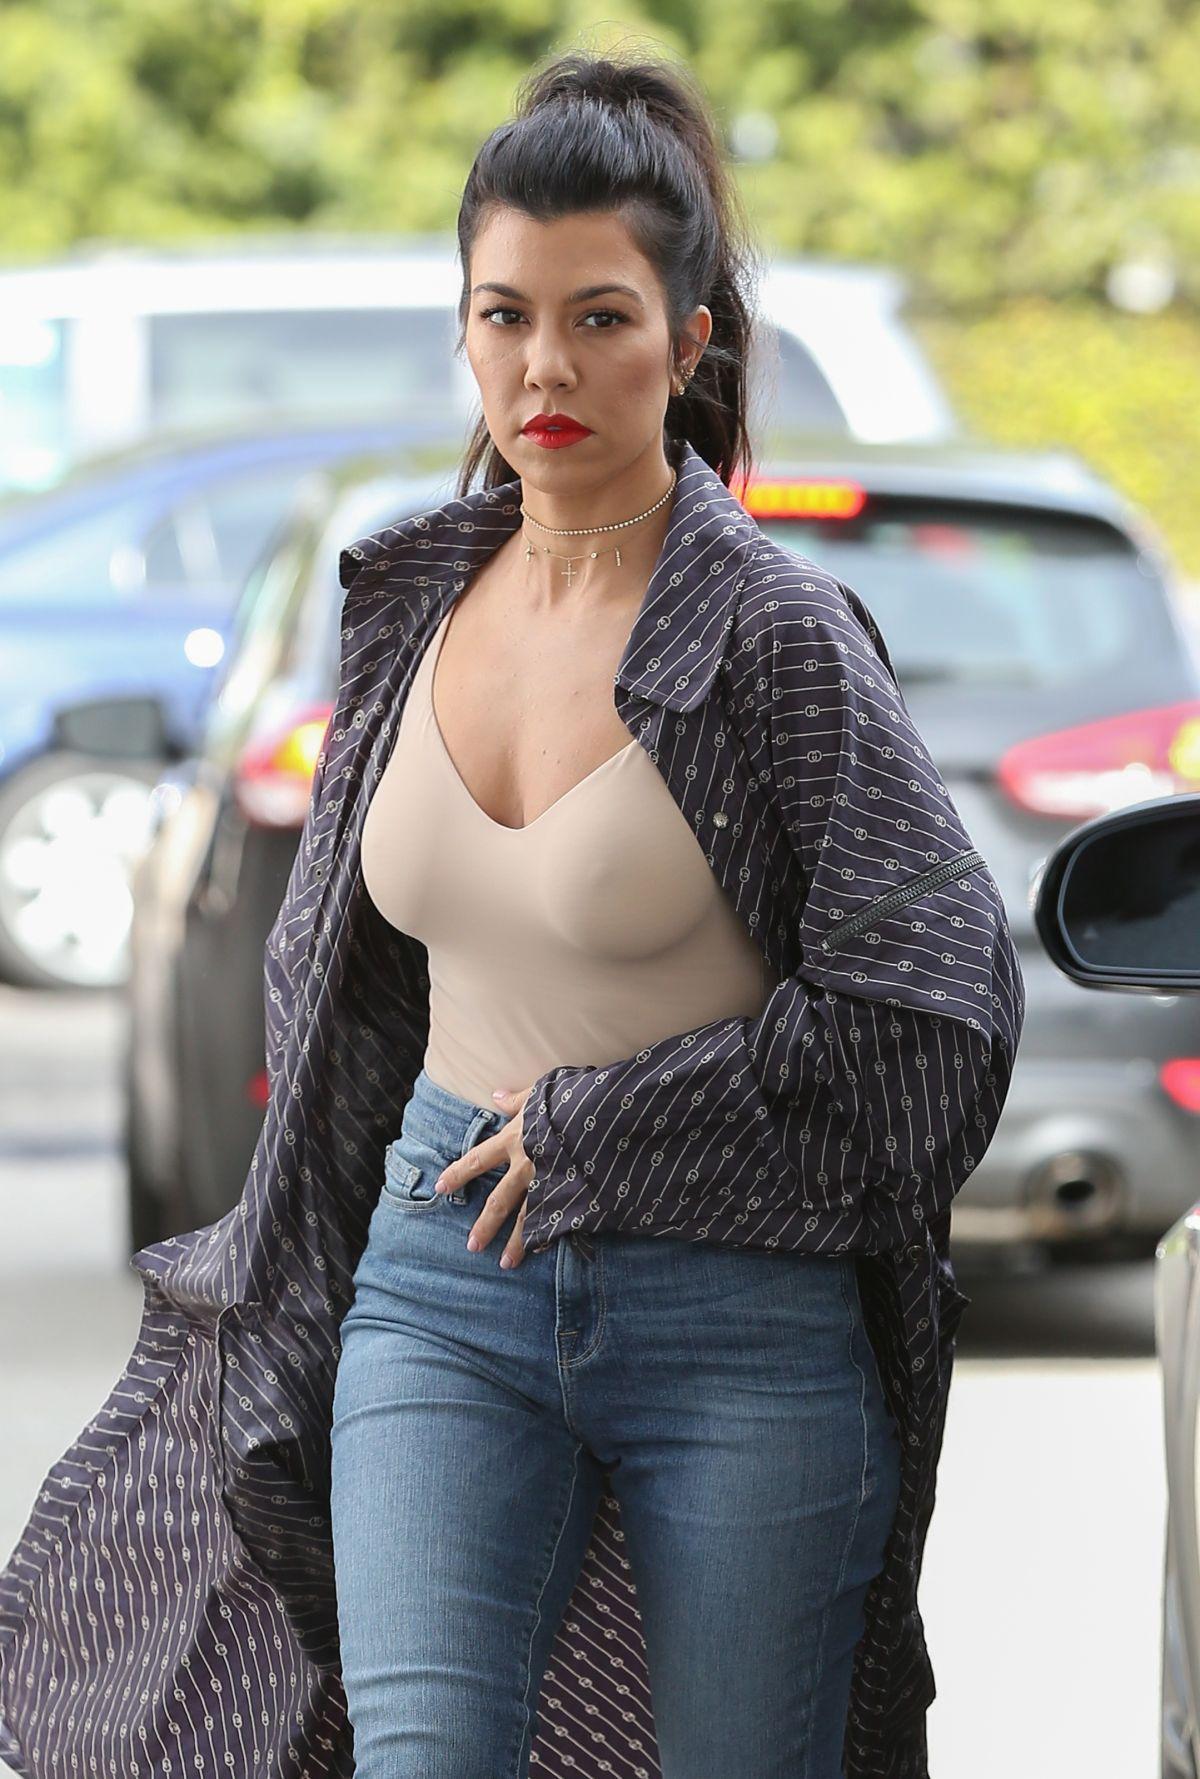 Kourtney Kardashian  Yahoo Image Search Results  Raven Haired